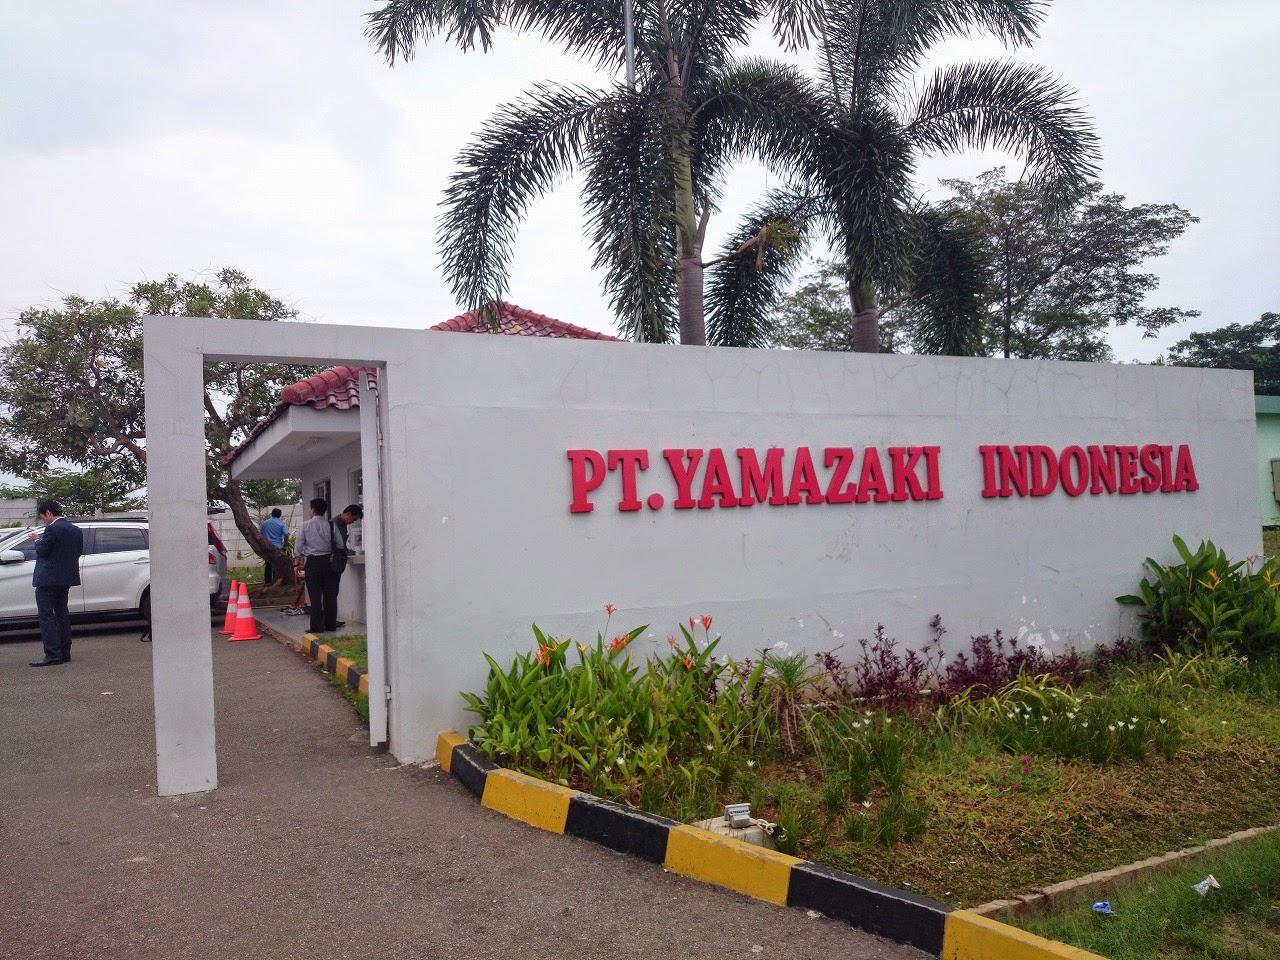 Lowongan Kerja Daerah Deltamas Cikarang PT.Yamazaki Indonesia